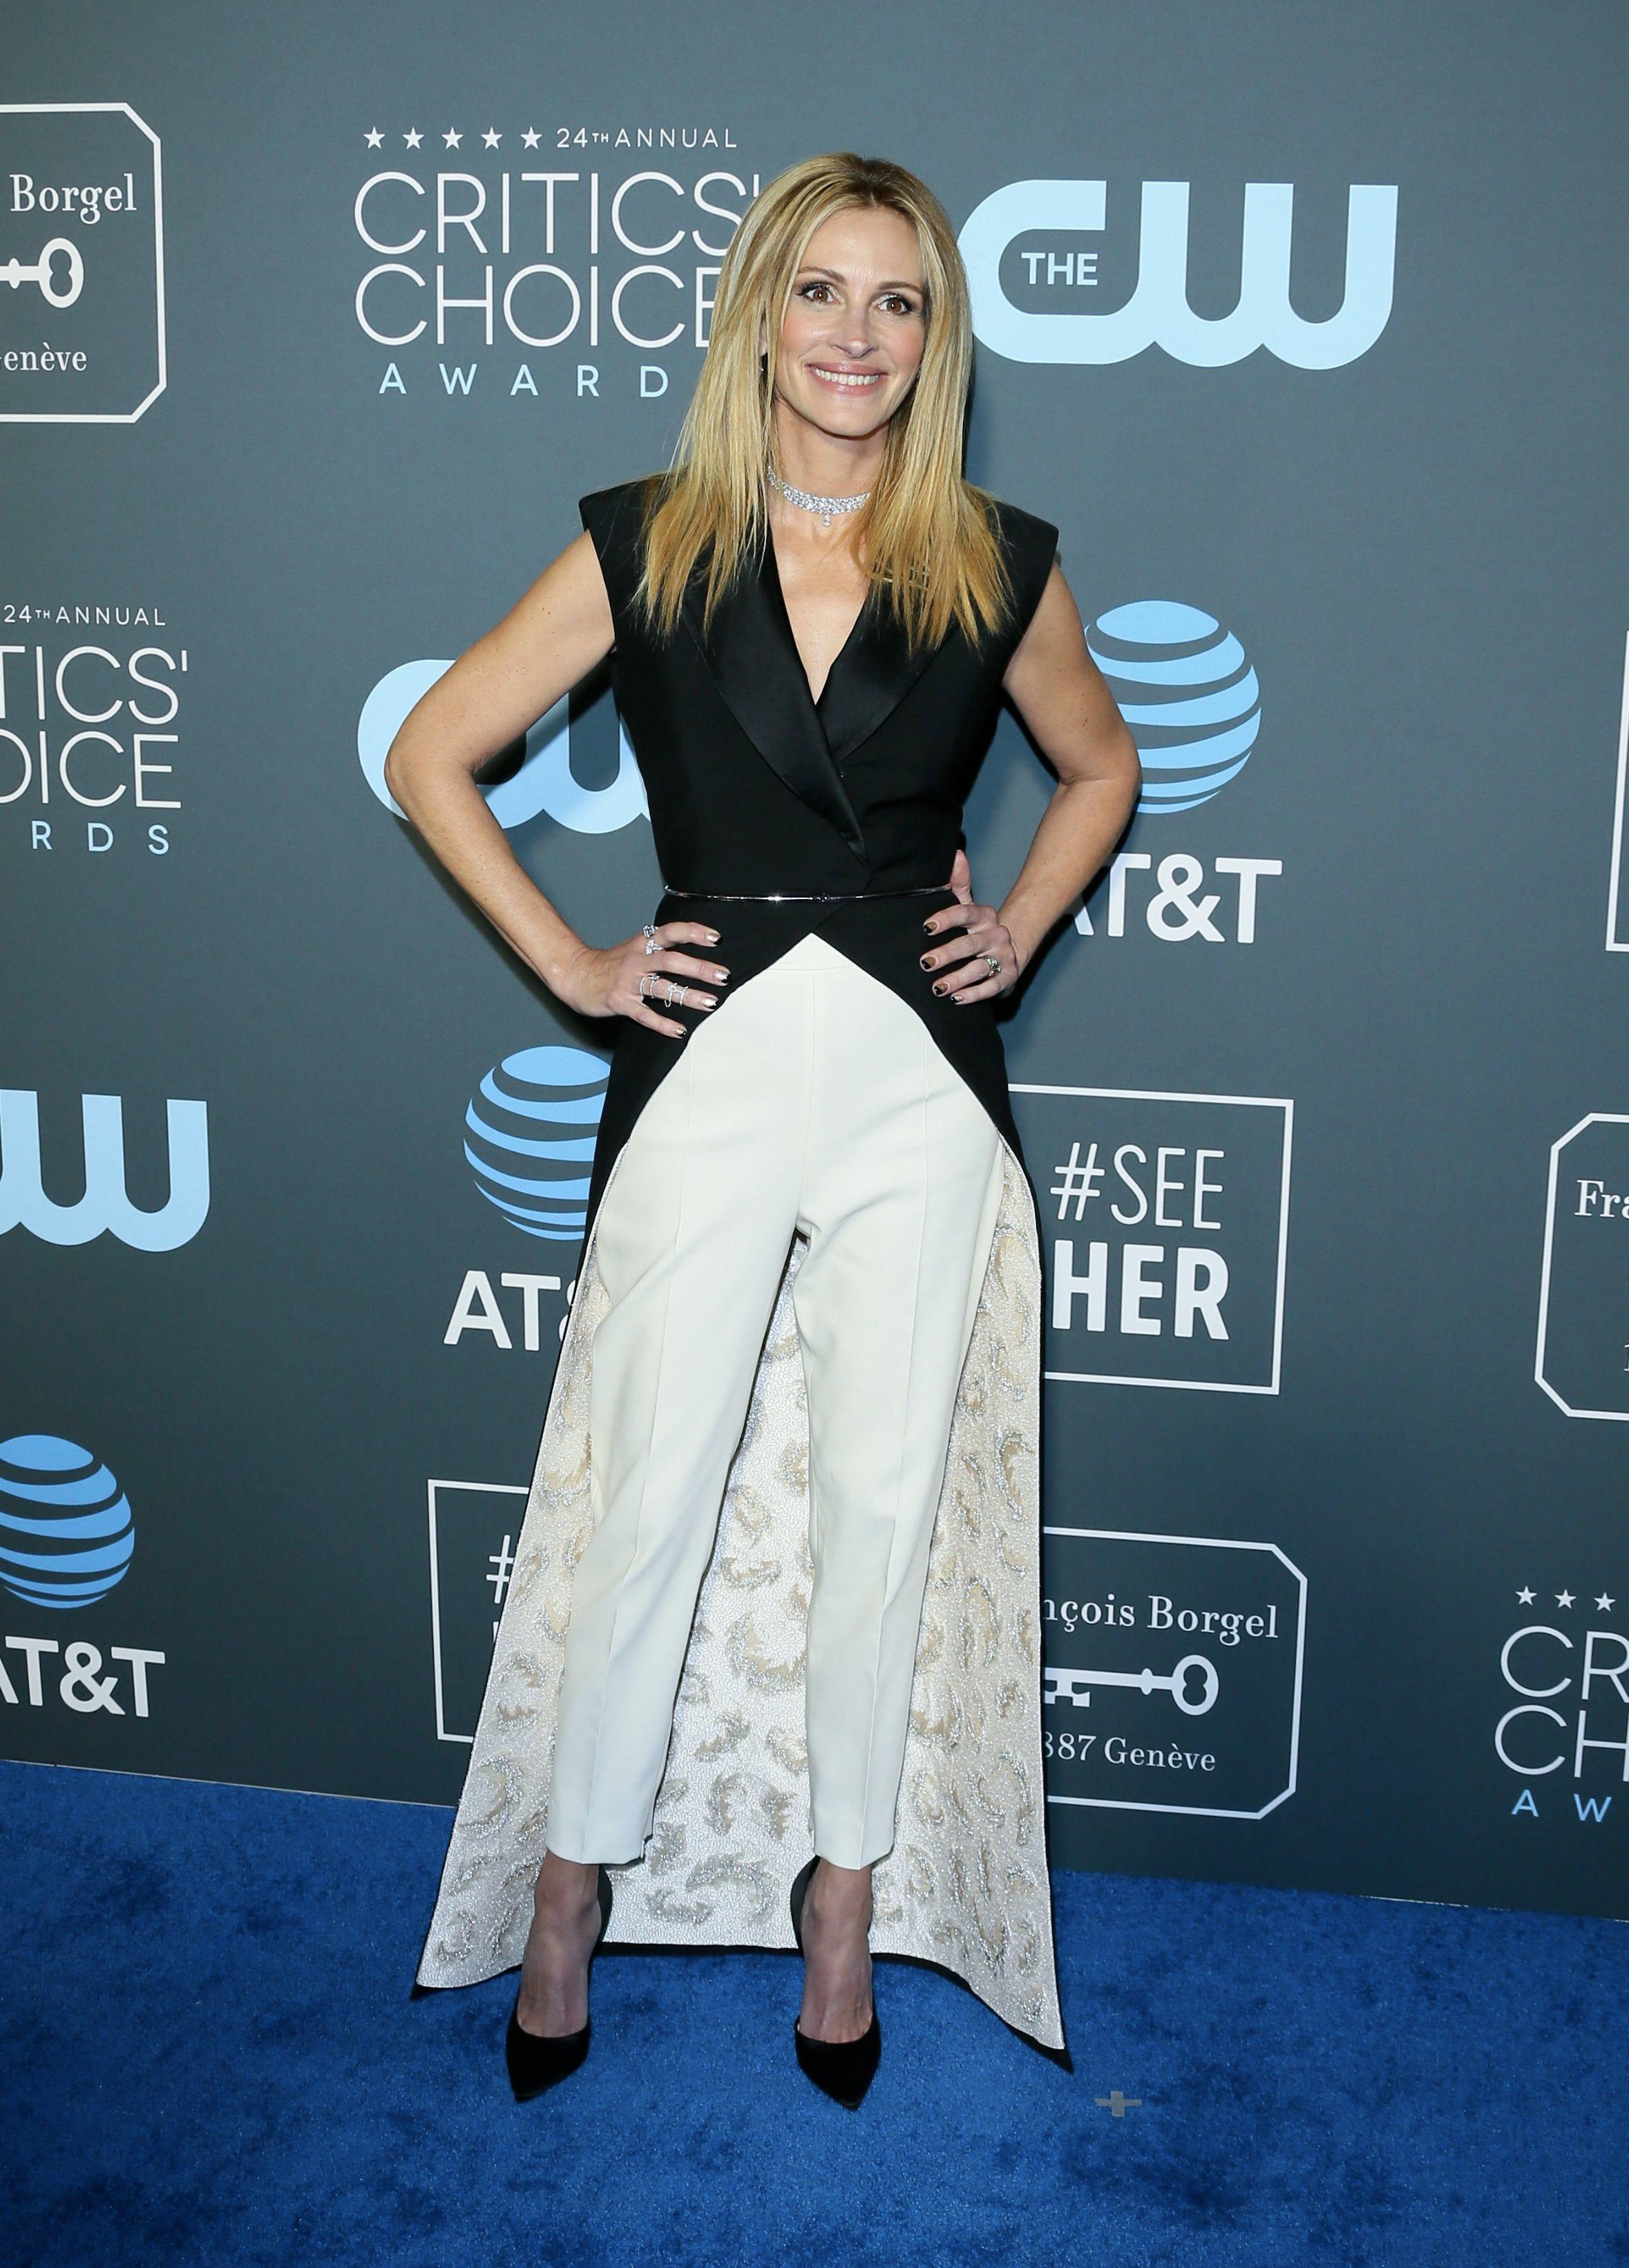 Critics Choice Awards 2019 The Worst Dressed Stars From Amy Adams